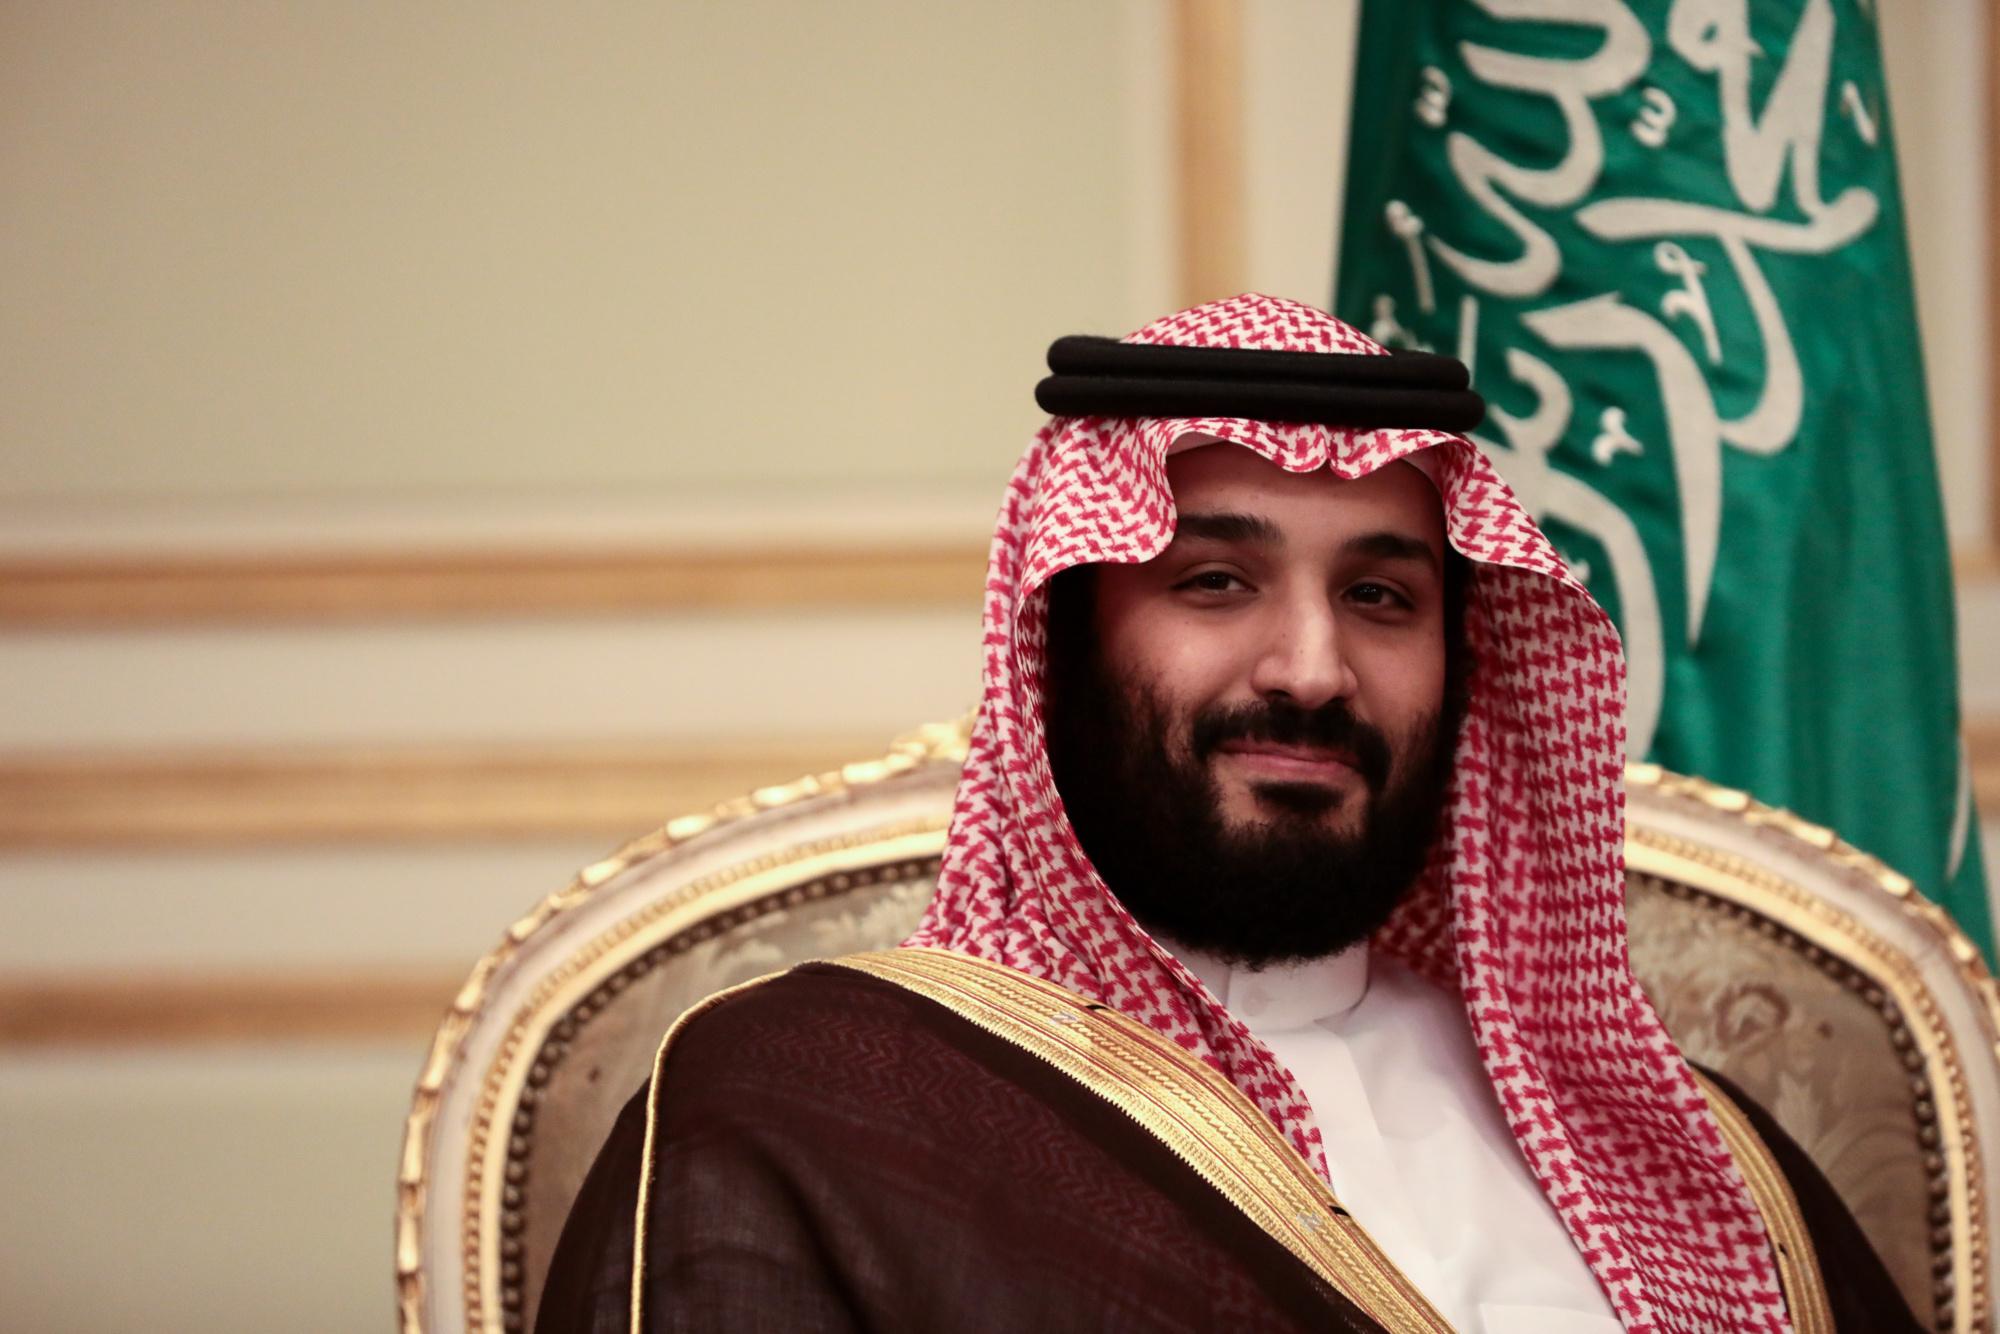 Mohammed bin Salman, Saudi Arabia's Crown Prince. Photographer: Simon Dawson/Bloomberg